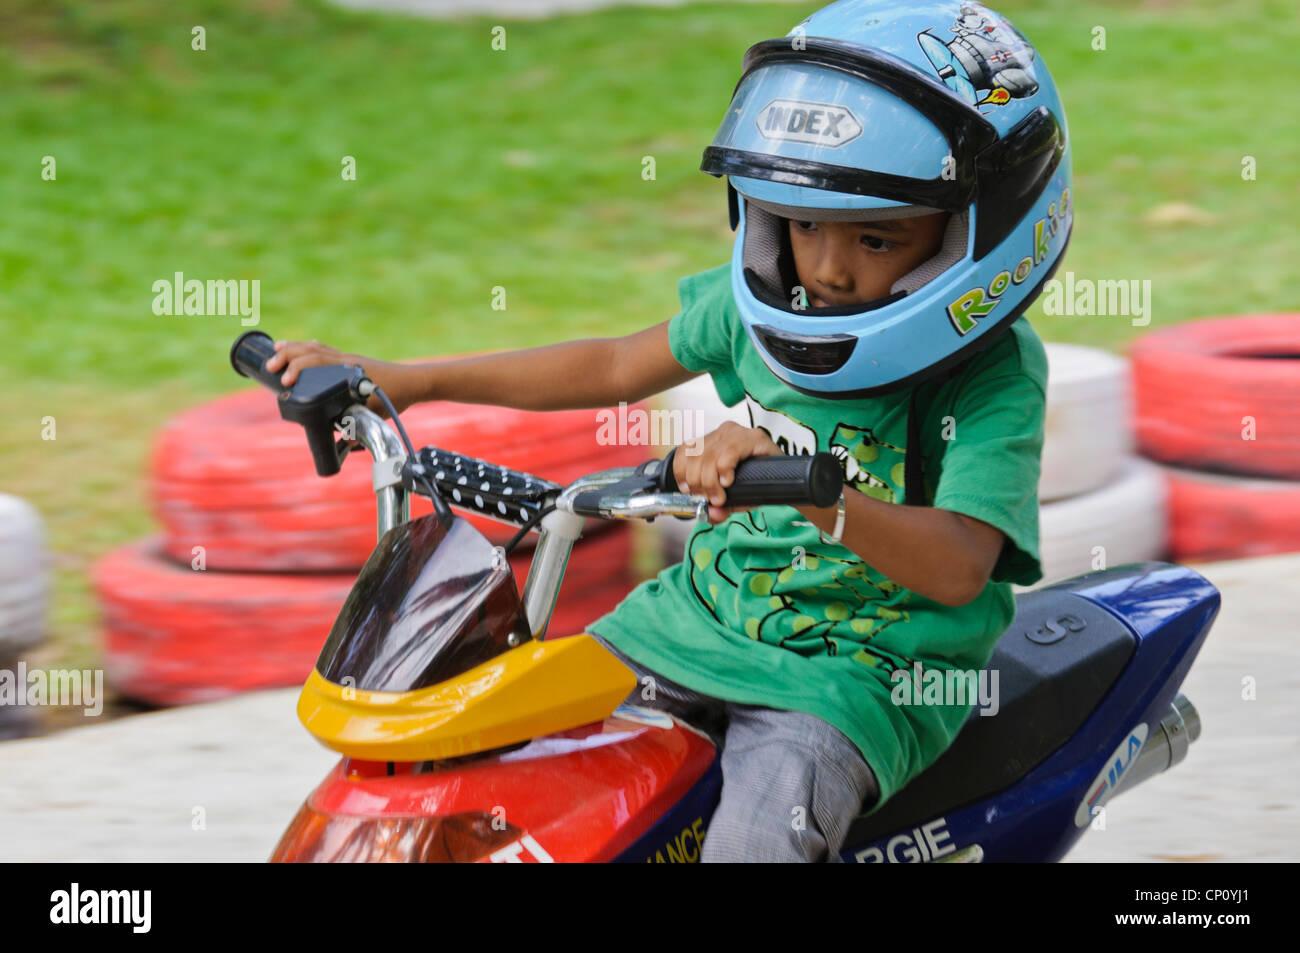 Young 4 5 Years Boy Blue Helmet Riding Children Atv Quad Racing On Stock Photo Alamy